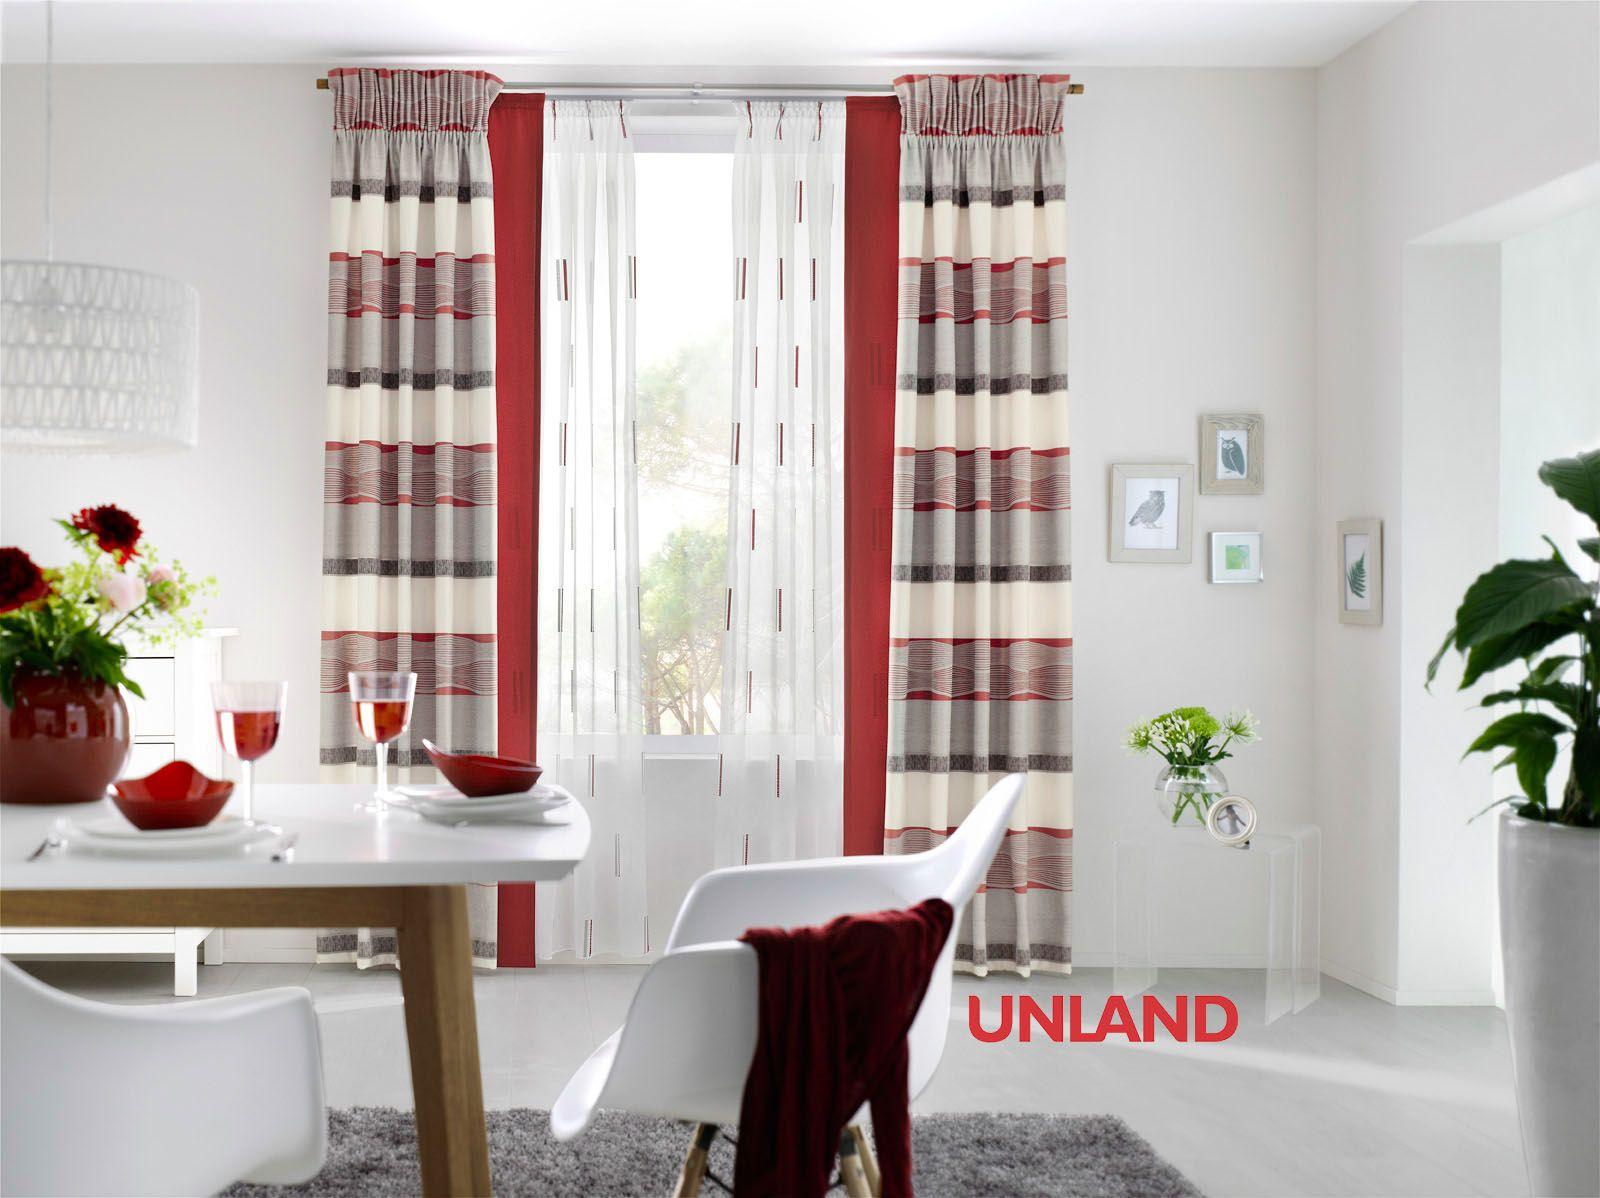 Unland Gardinen unland mixed fensterideen gardinen und sonnenschutz curtains